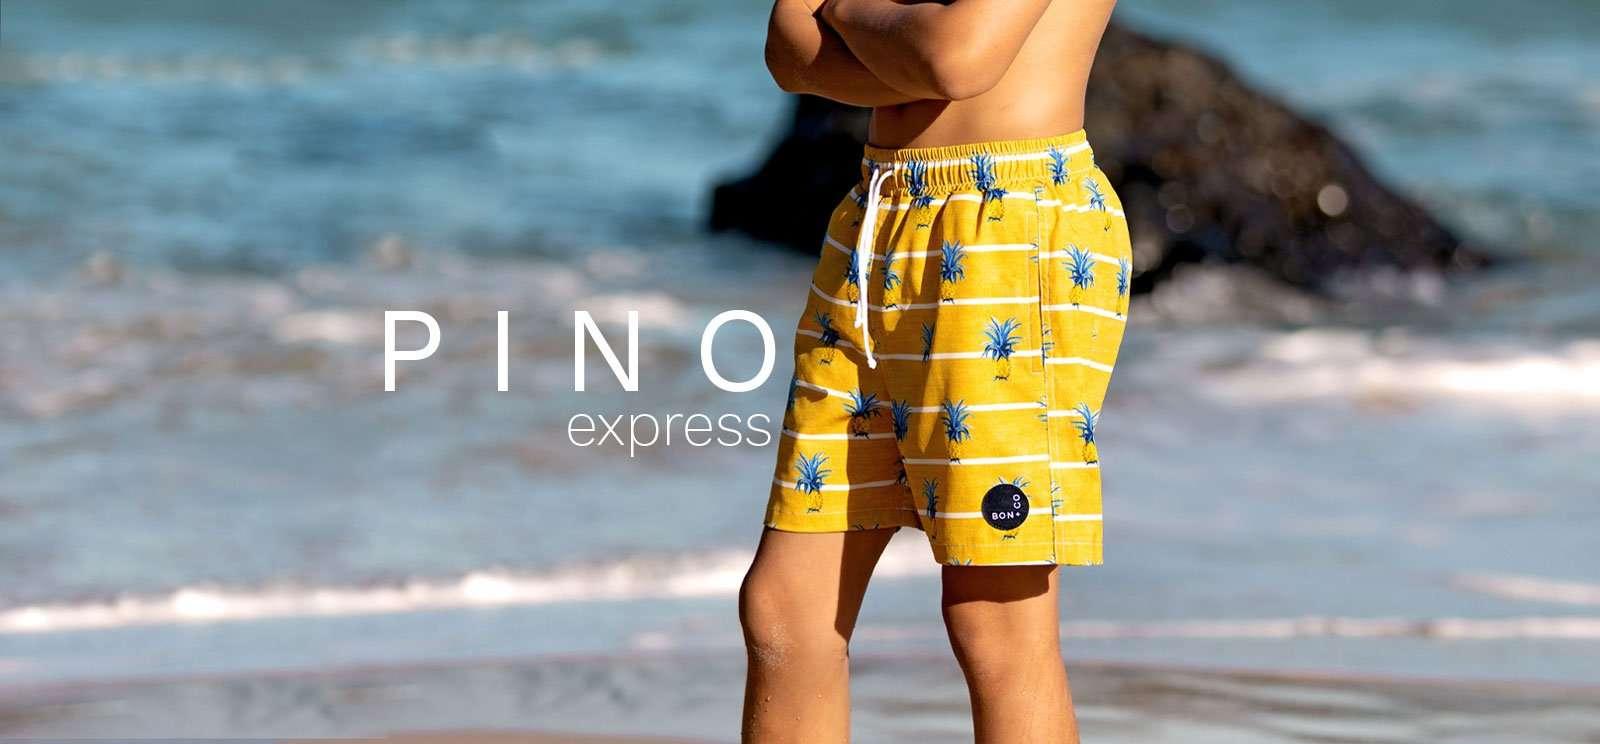 Pino-Express